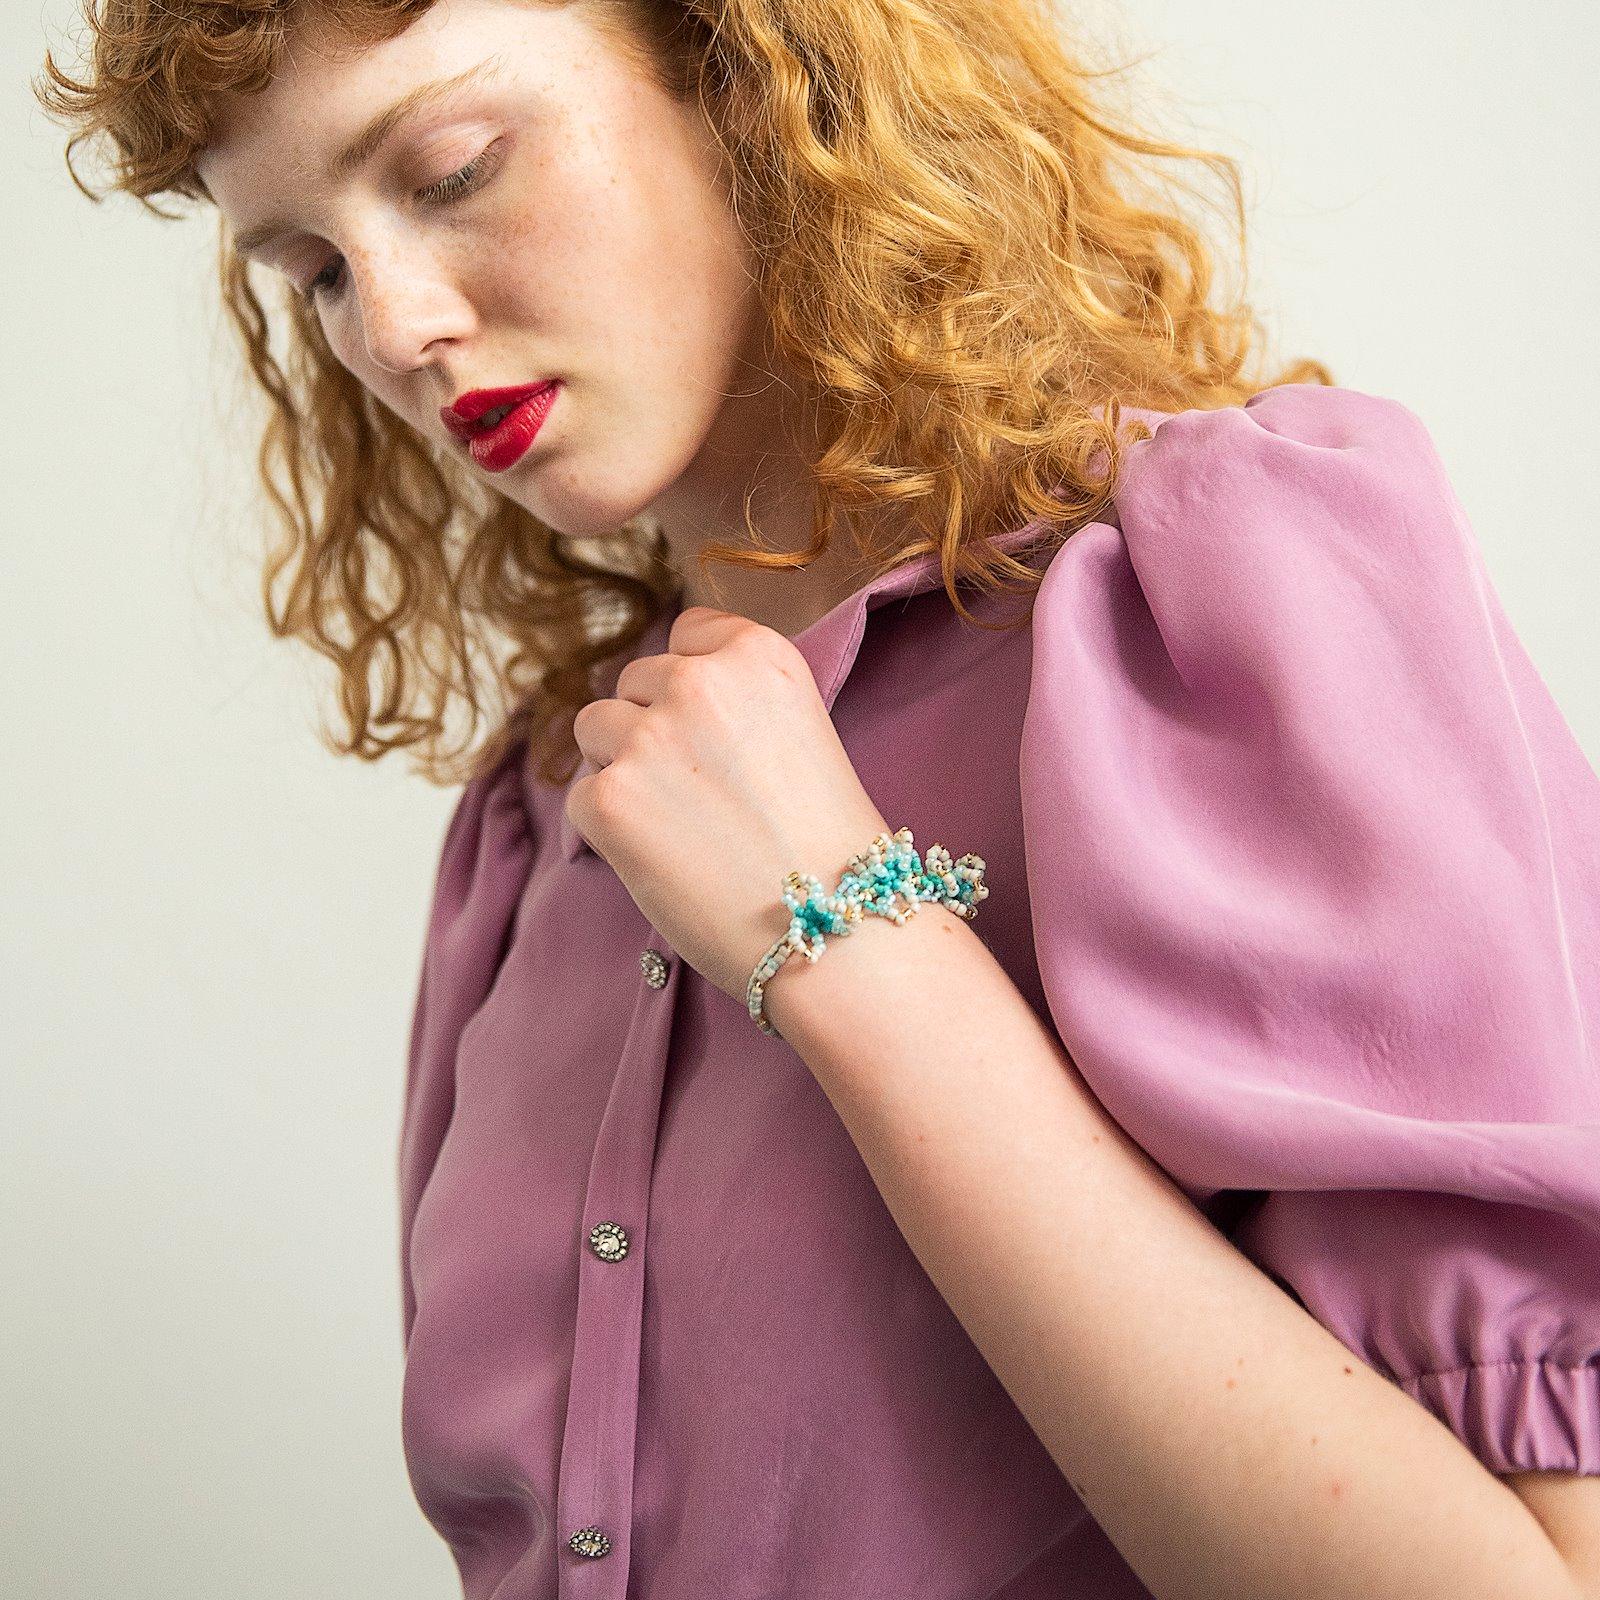 Design your own blouse, 46/18 p22075_501885_40599_sskit